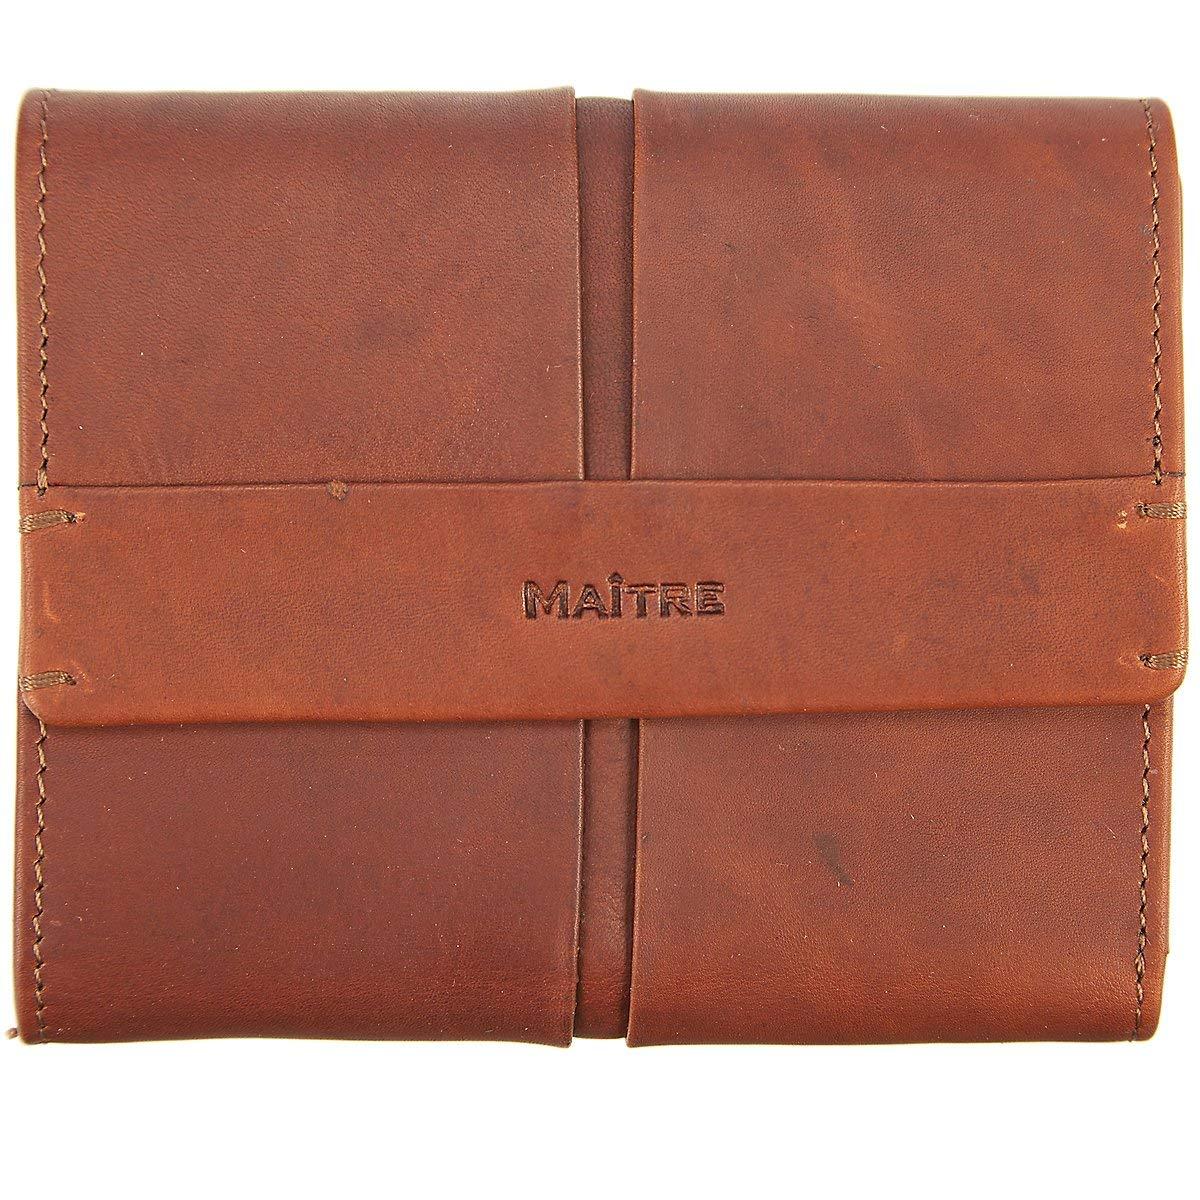 Maitre Handtaschen Taschen 4060001373 Braun pVHxk